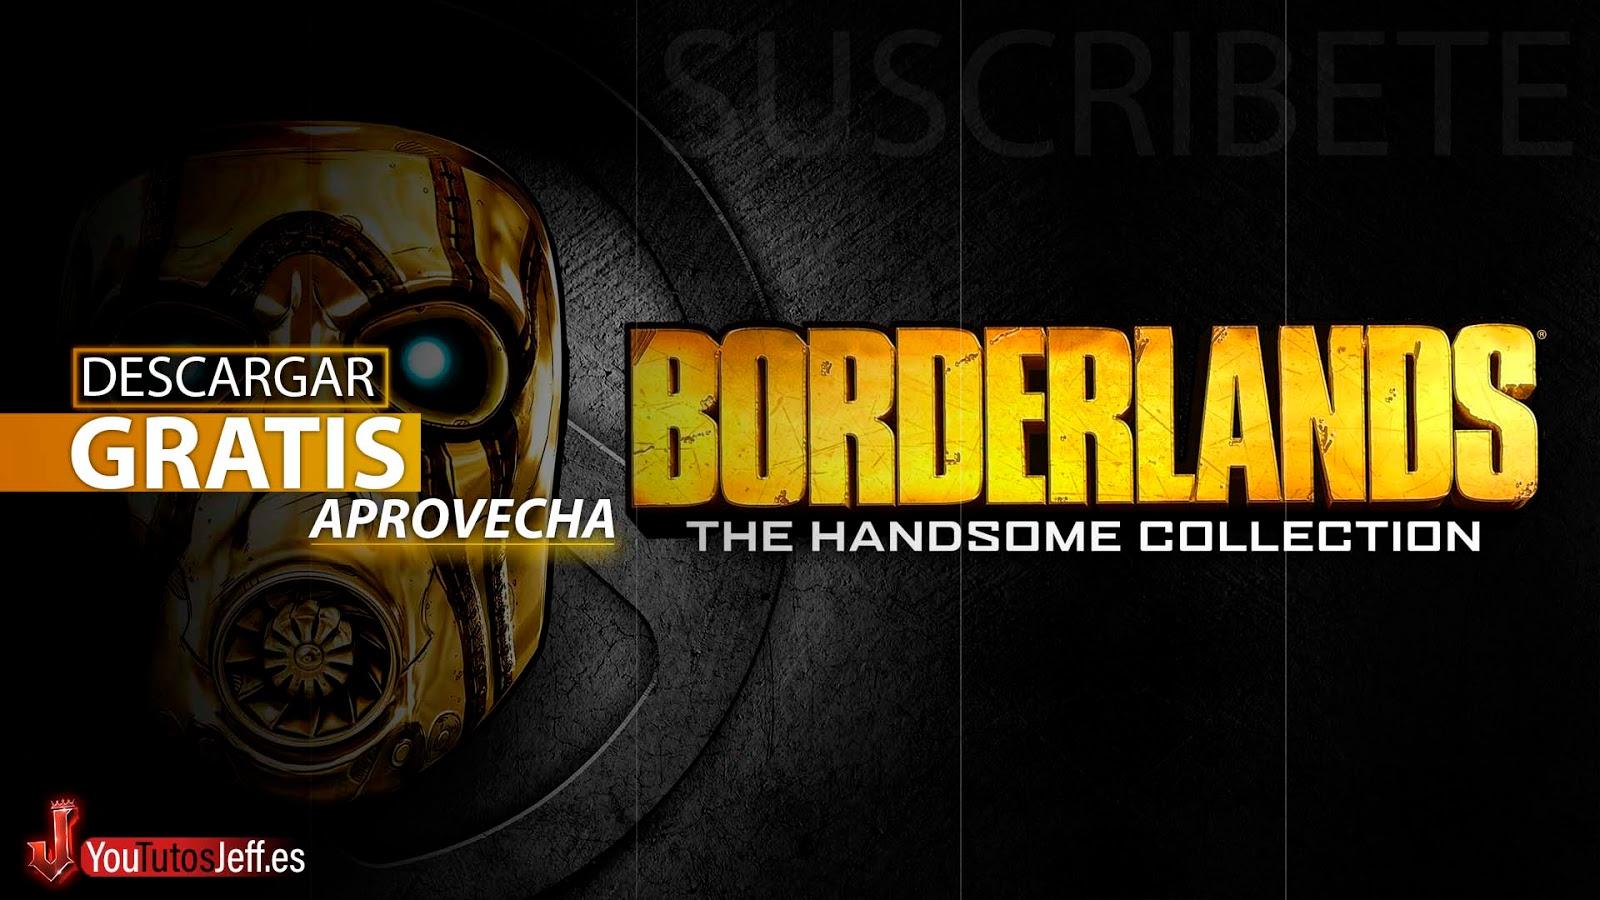 Descargar Borderlands The Handsome Collection Gratis PC, Aprovecha Ahora